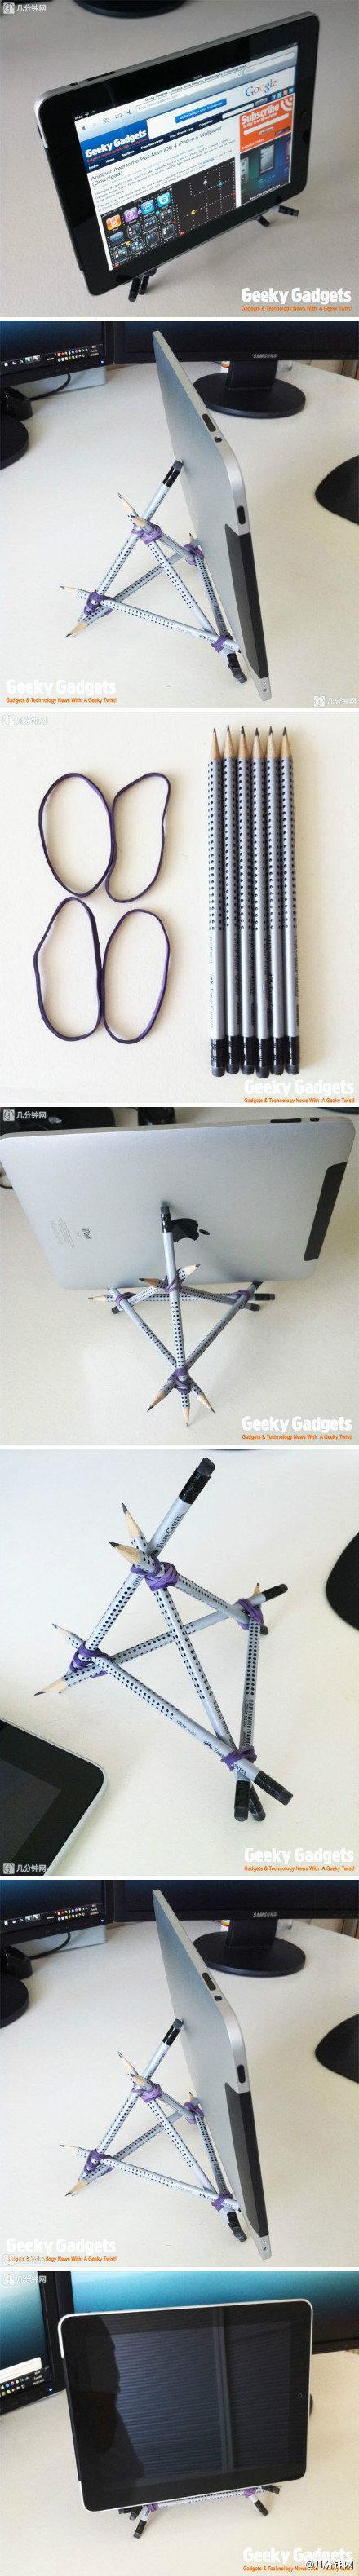 diy, diy projects, diy craft, handmade, diy simple tablet stand